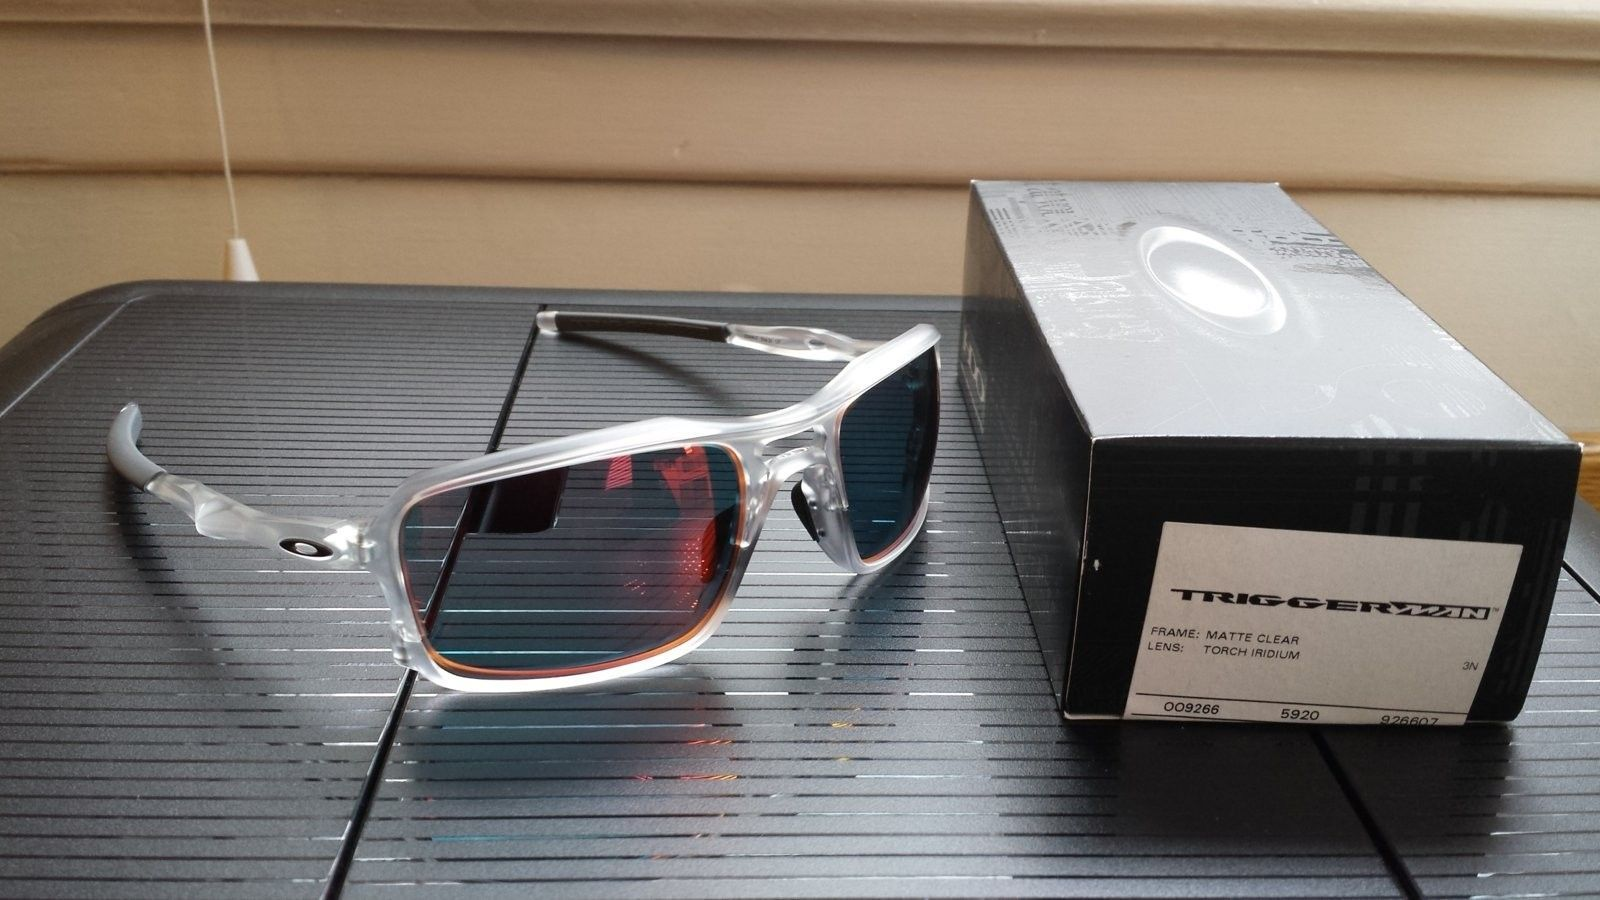 Matte Clear/ Torch Triggerman - 20160612_133059.jpg